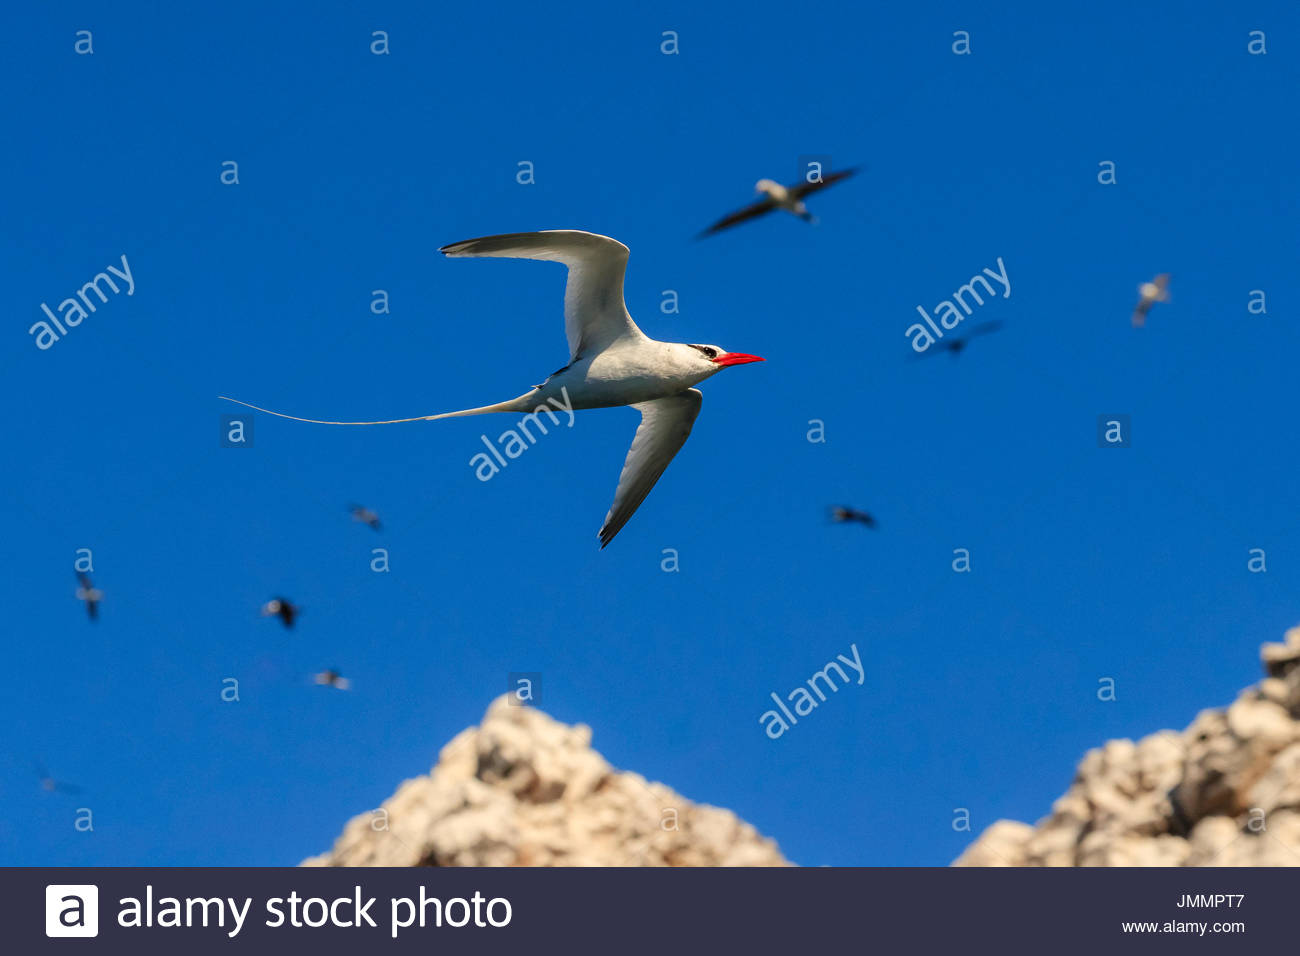 Red-billed tropic Bird, Phaethon aethereus, im Flug bei San Pedro Martir Insel. Stockbild